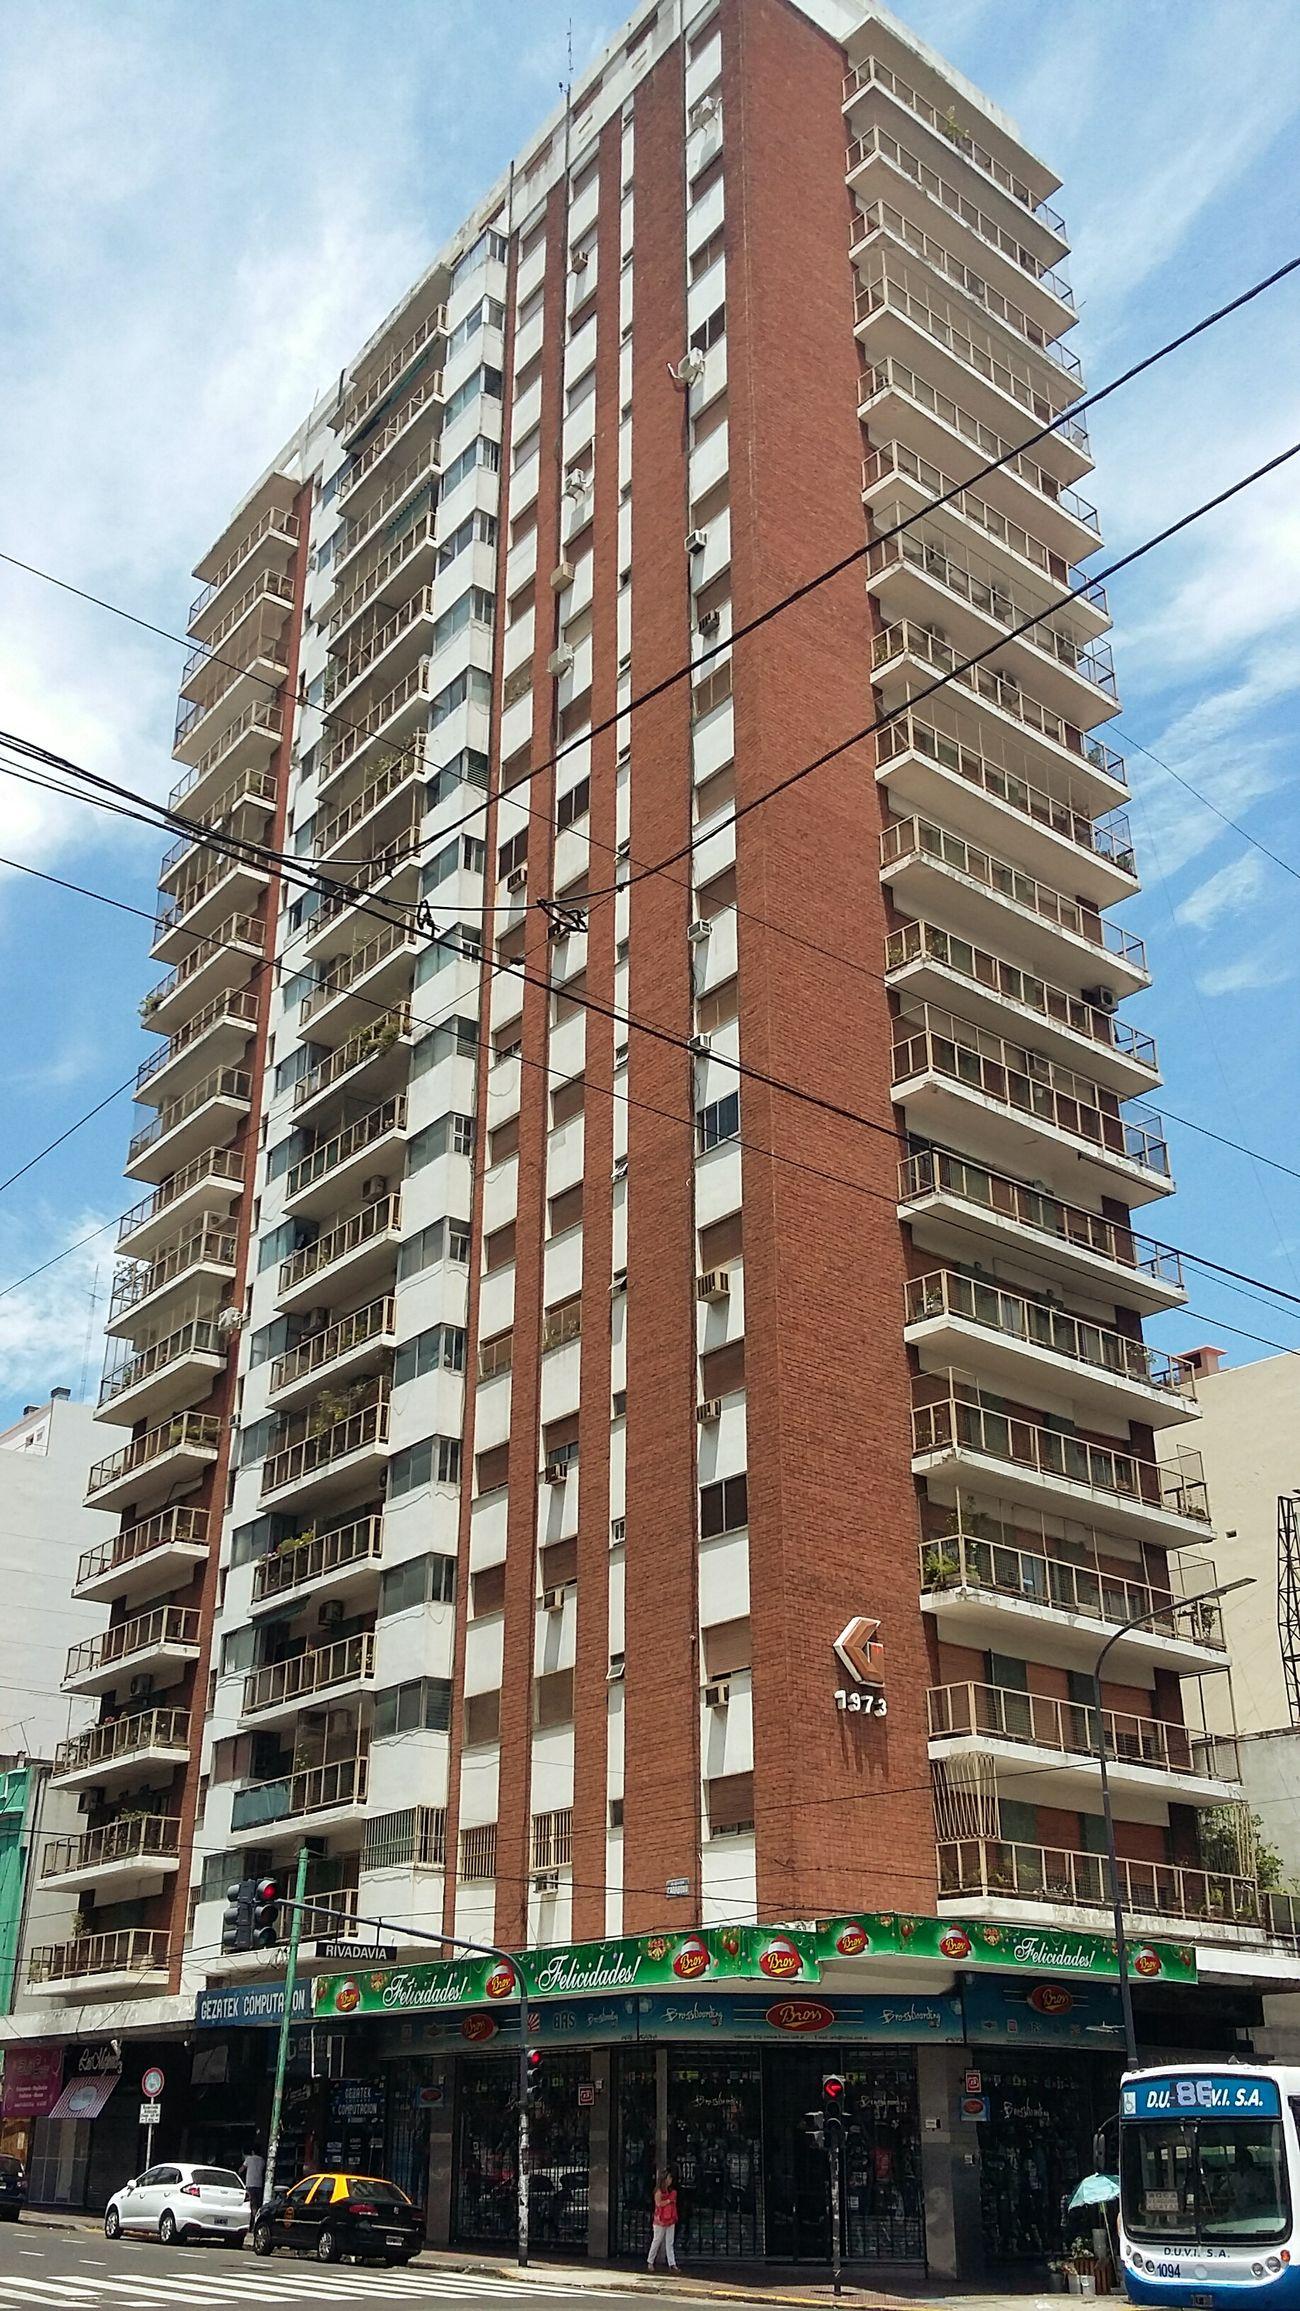 Argentina Capital Federal Buenosaires Buenos Aires Barrio Barrio De Flores Urban Urbanphotography Arquitecture Arquitectura Pothography Architecture Architecture Architecturephotography Building Buildingsandtrees Streetphotography Street